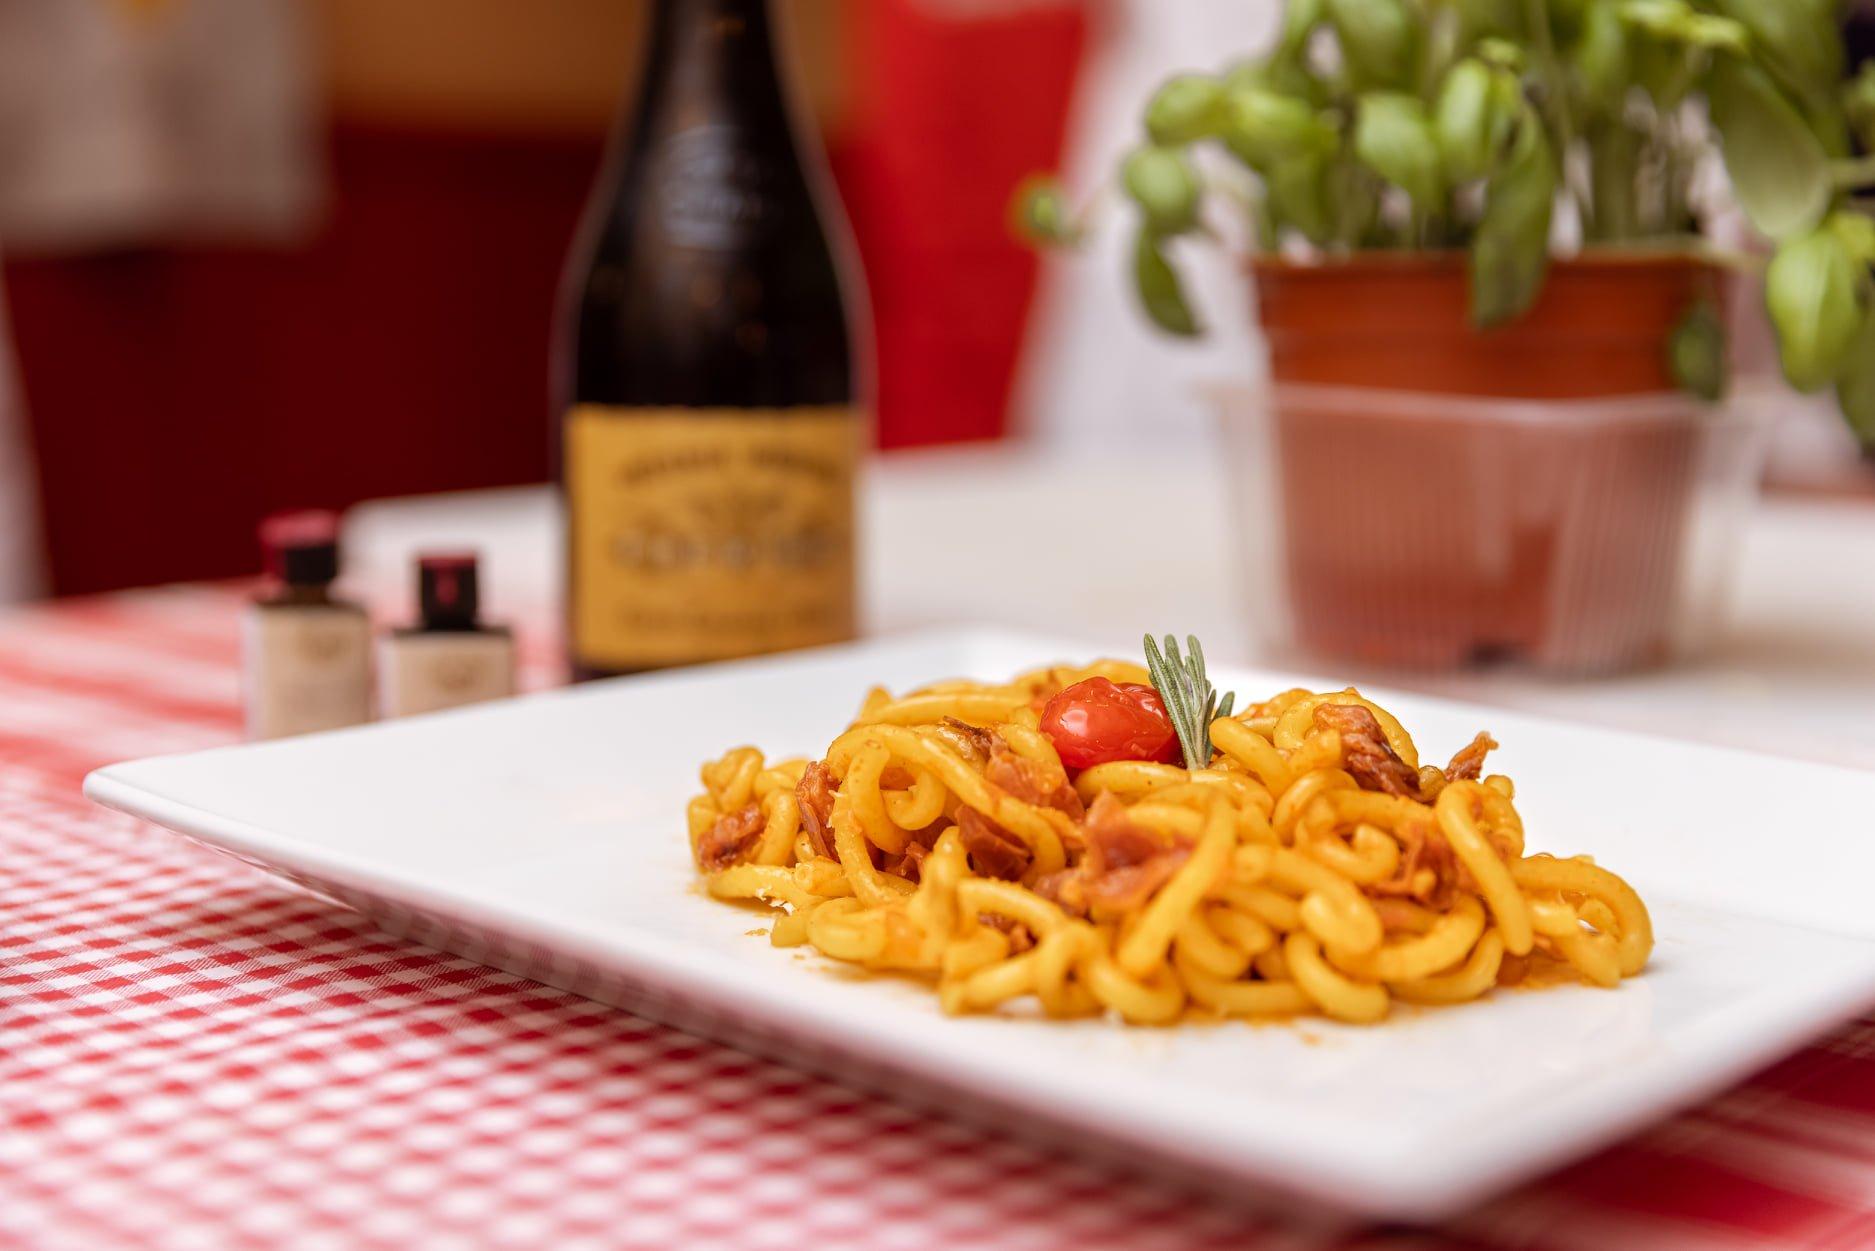 The Authentic Italian Table - L'Emilia Romagna, un paradiso per i buongustai